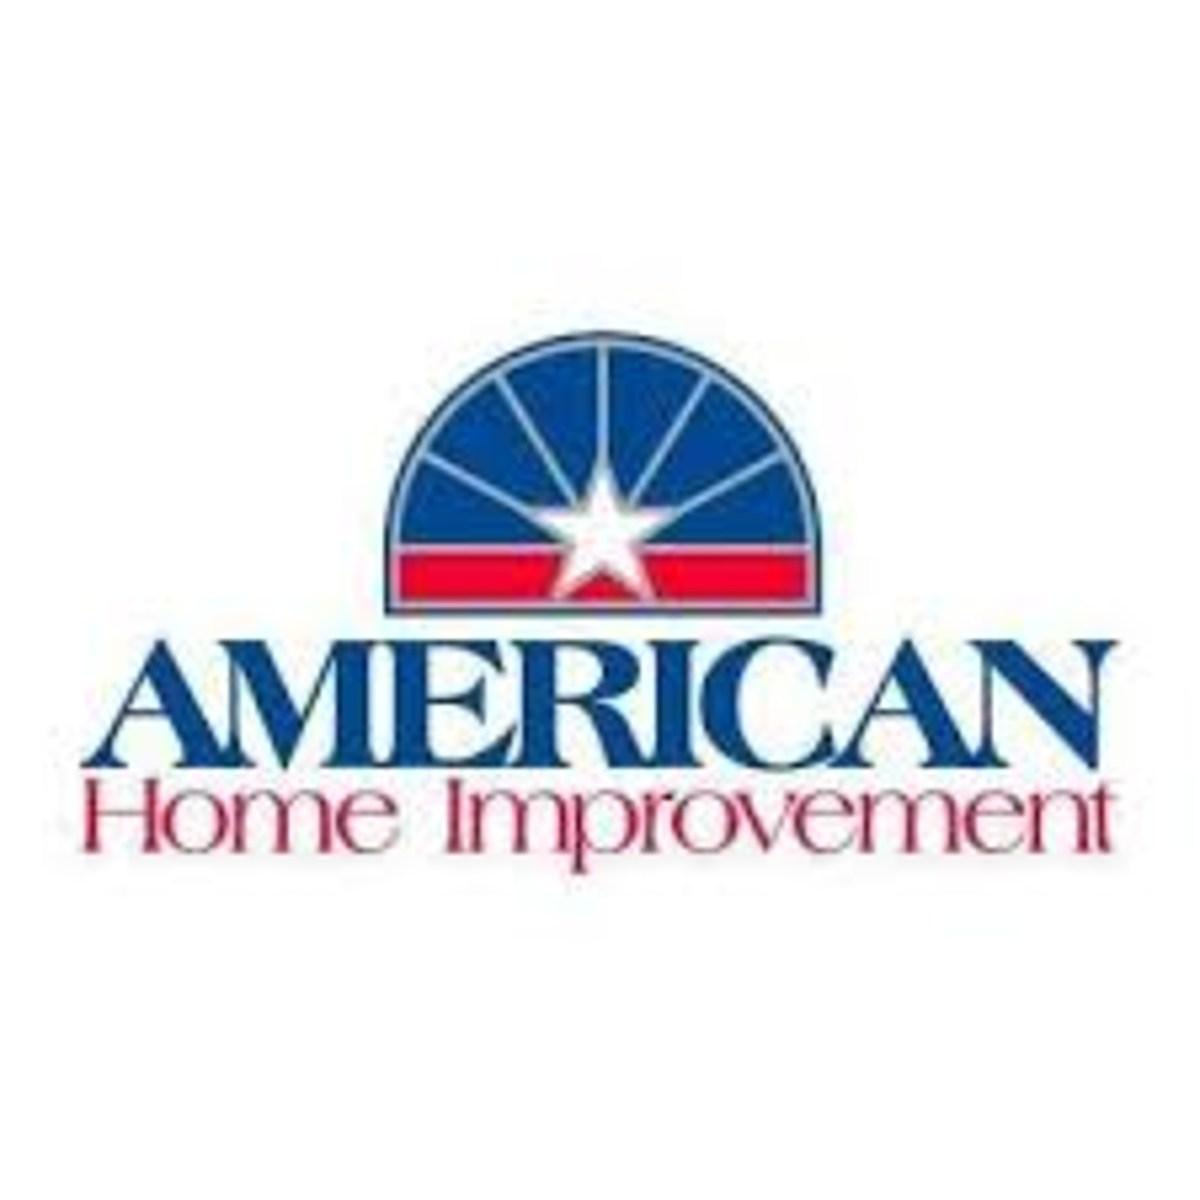 American Home Improvement